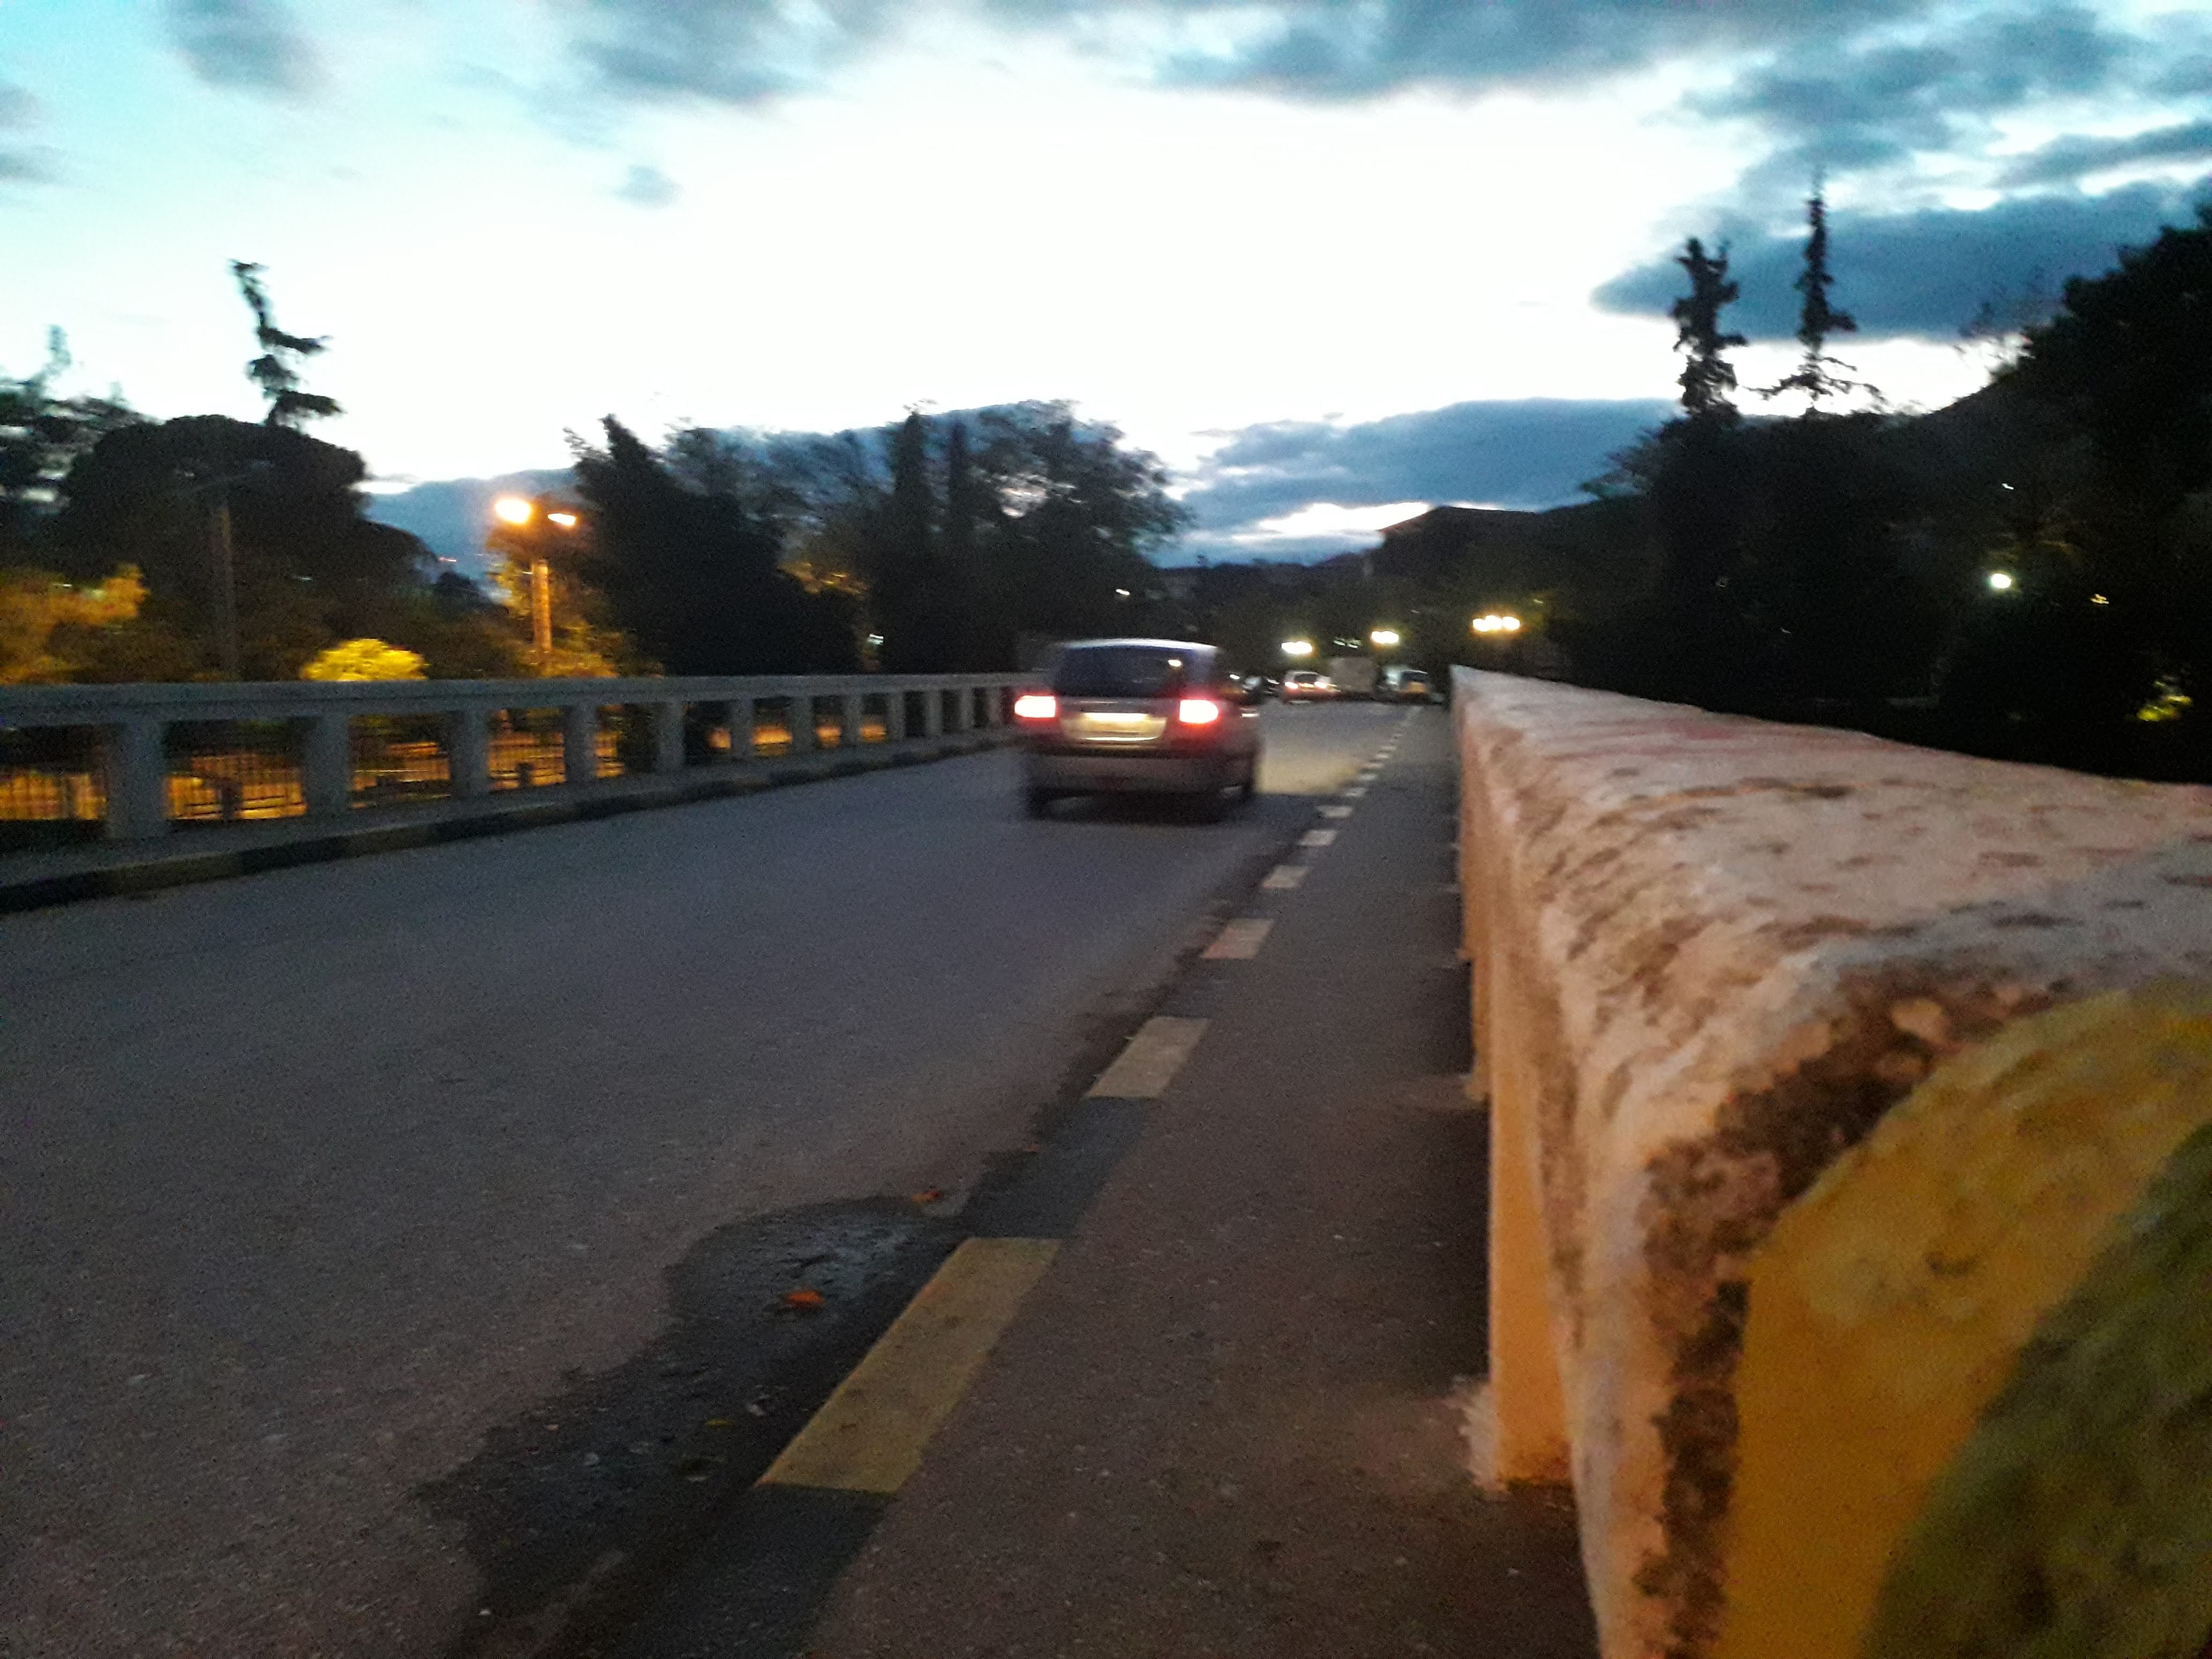 Fake news τα περί απαγωγής ανηλίκων στην Ξάνθη